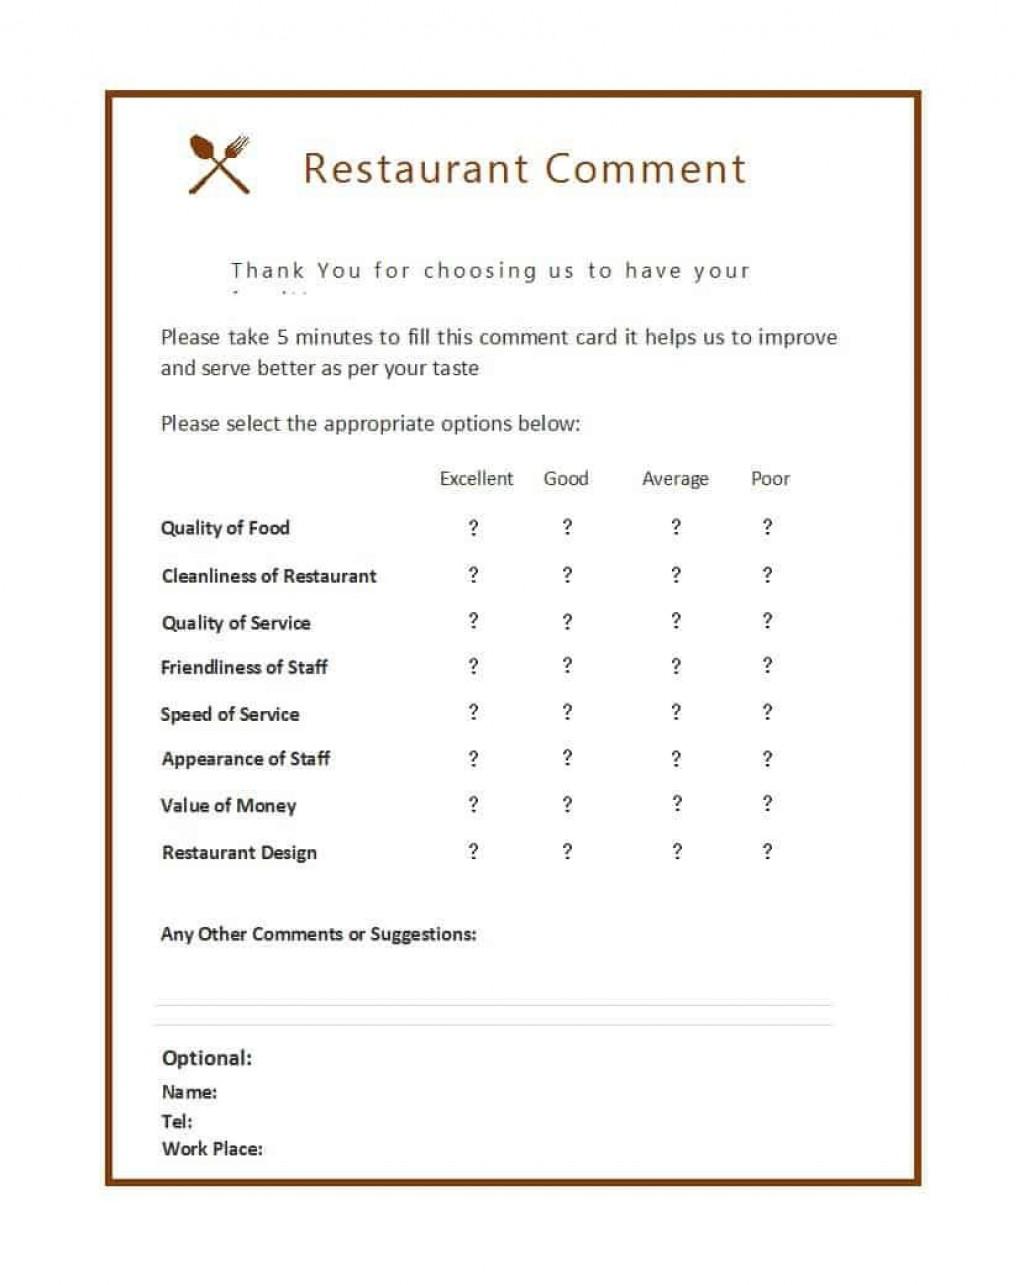 007 Singular Restaurant Comment Card Template For Word Design Large